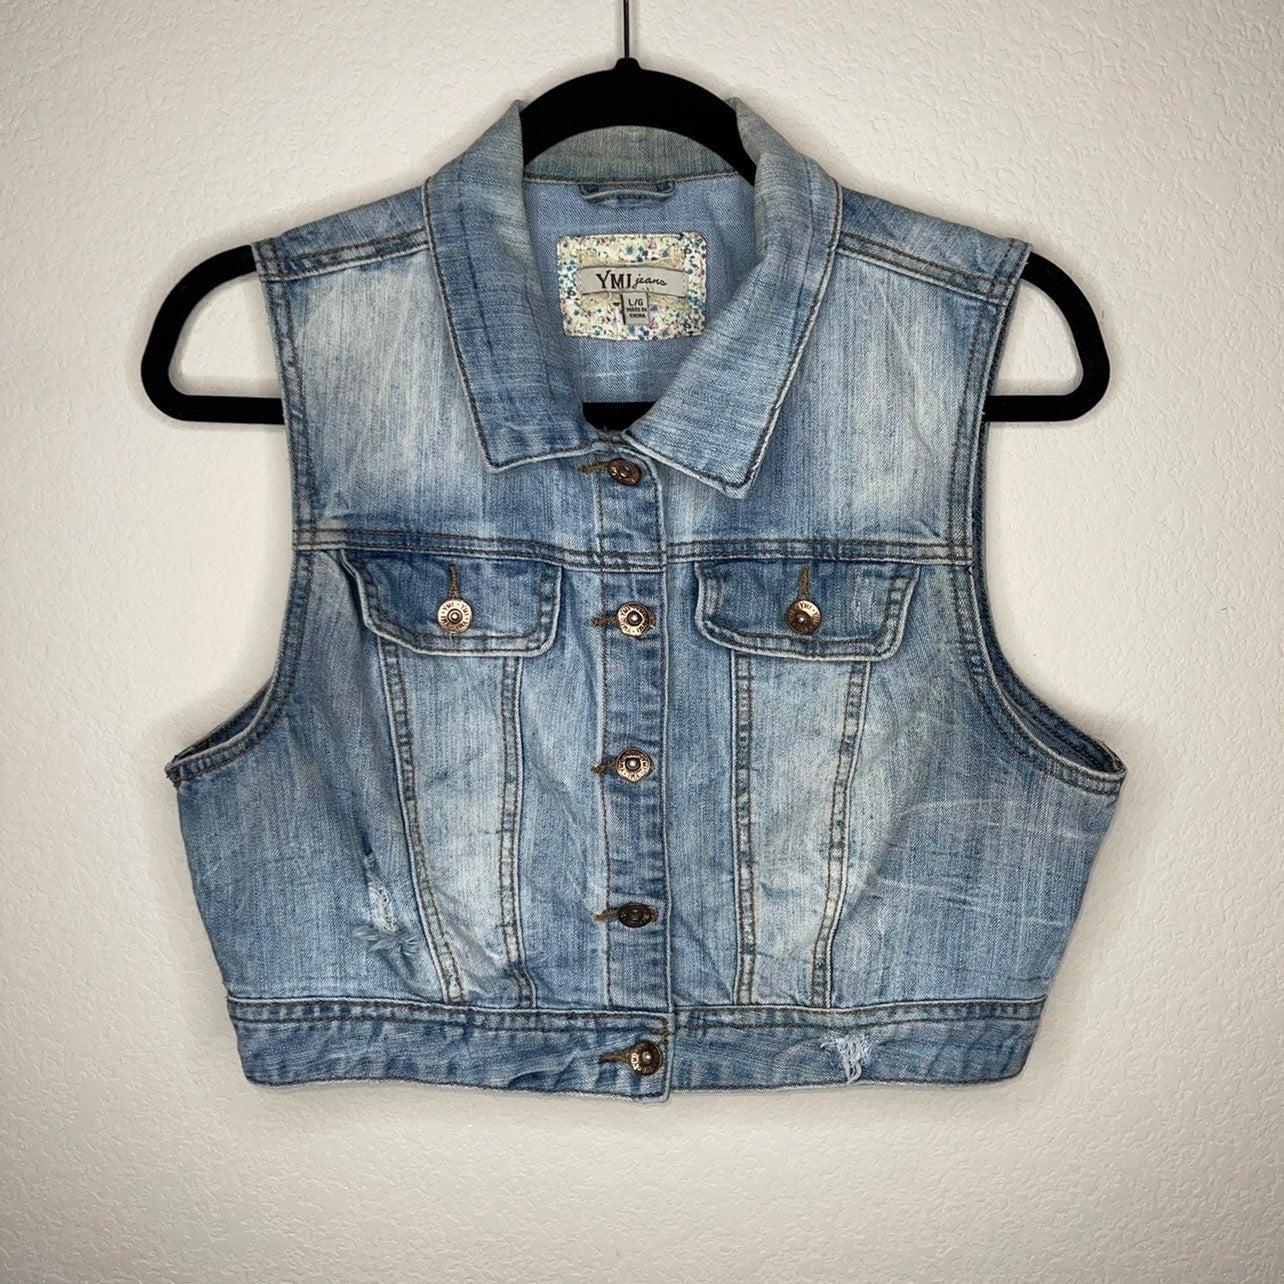 YMI Jeans Light Wash Denim Vest Jacket